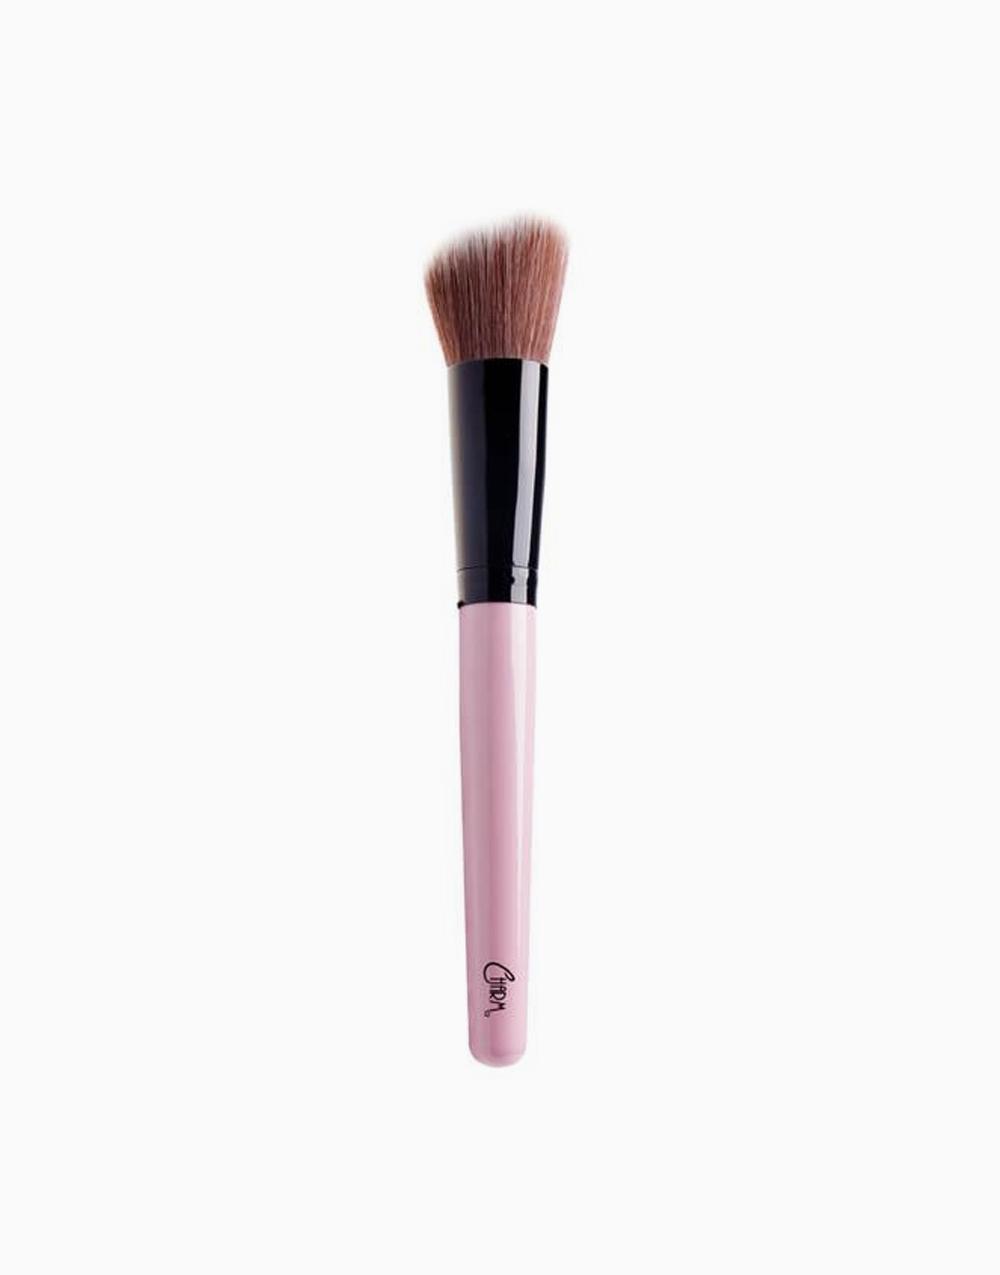 Vegan Contour/Blush Brush by Charm